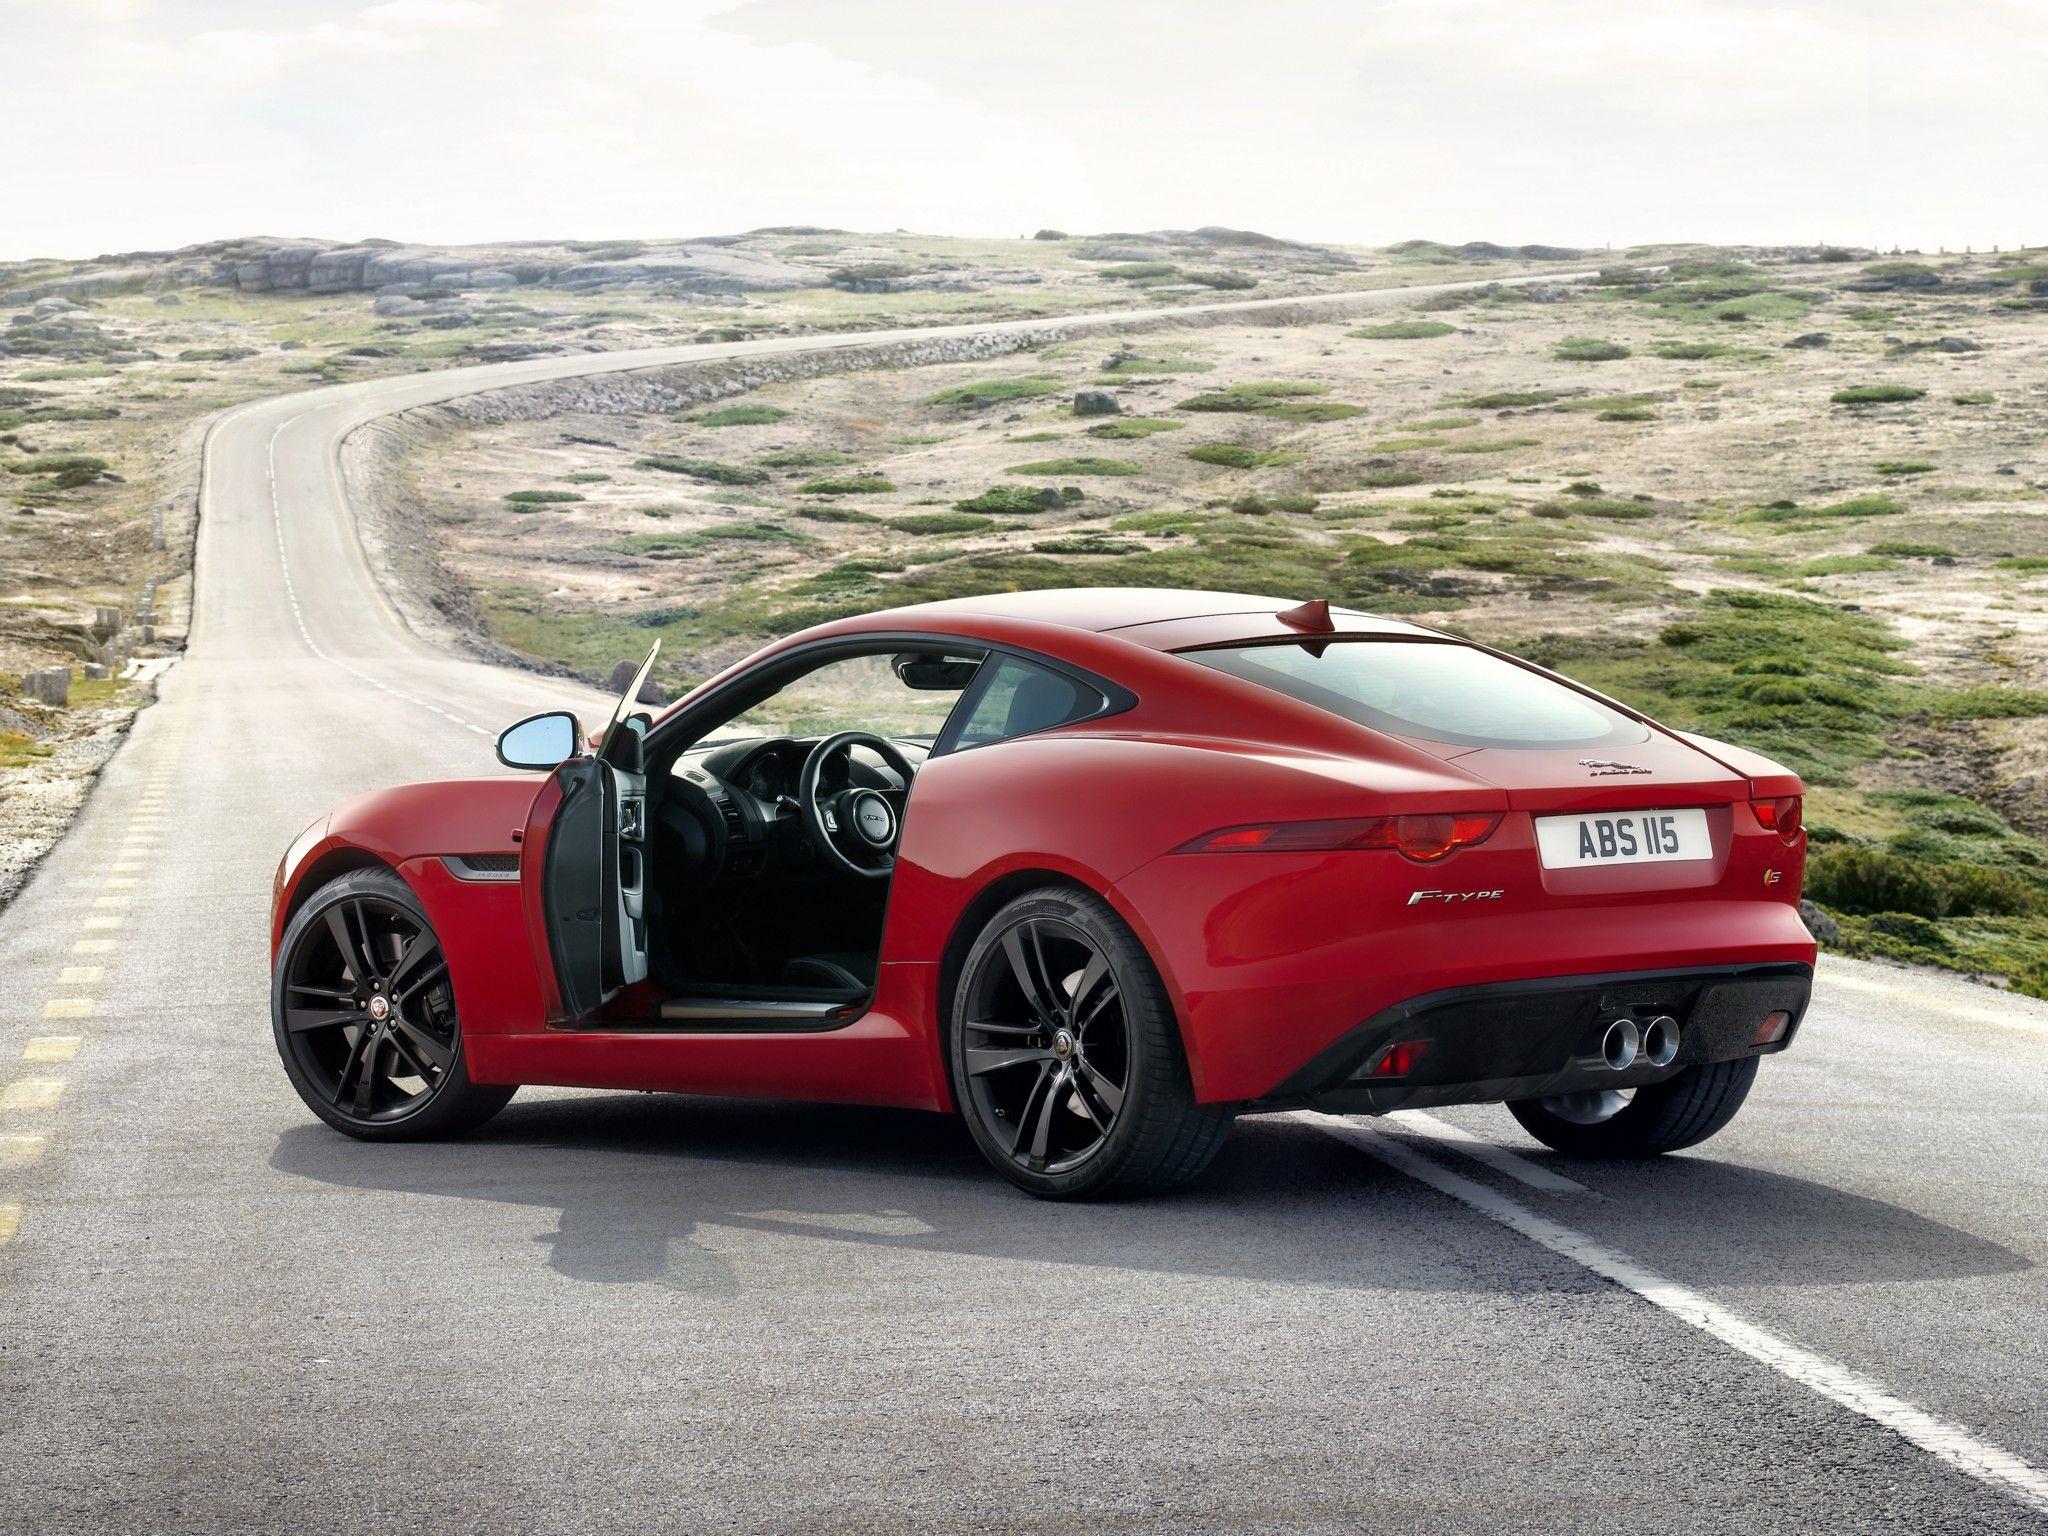 2013 Jaguar F-Type Pictures - Jaguar F-Type Forum